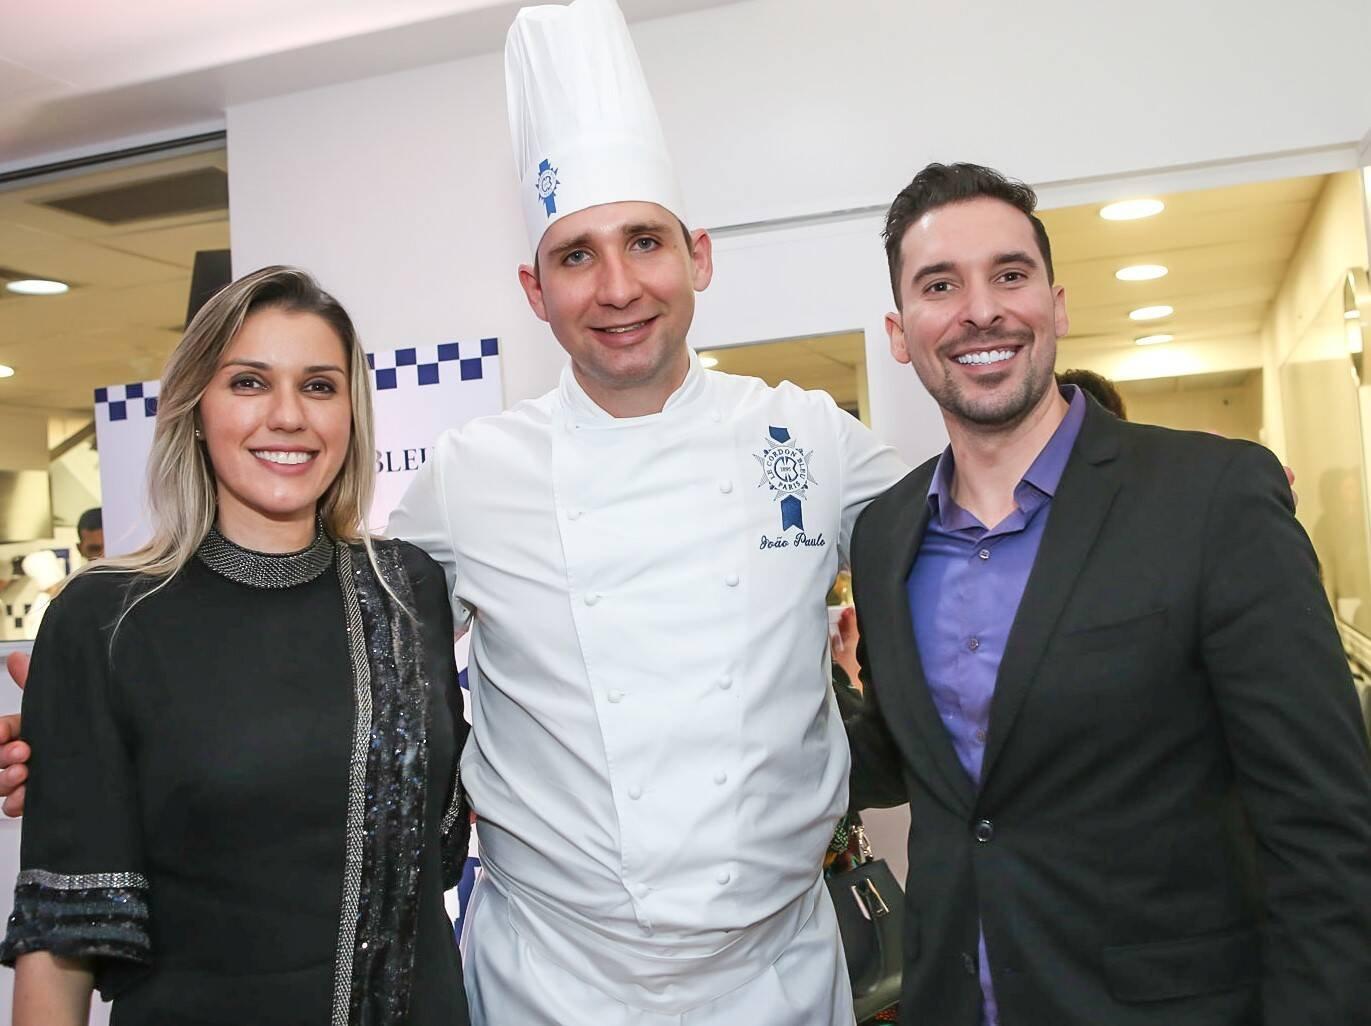 Ligia Reis, João Paulo Frankenfeld e Saulo Reis  /Foto: Gianne Carvalho